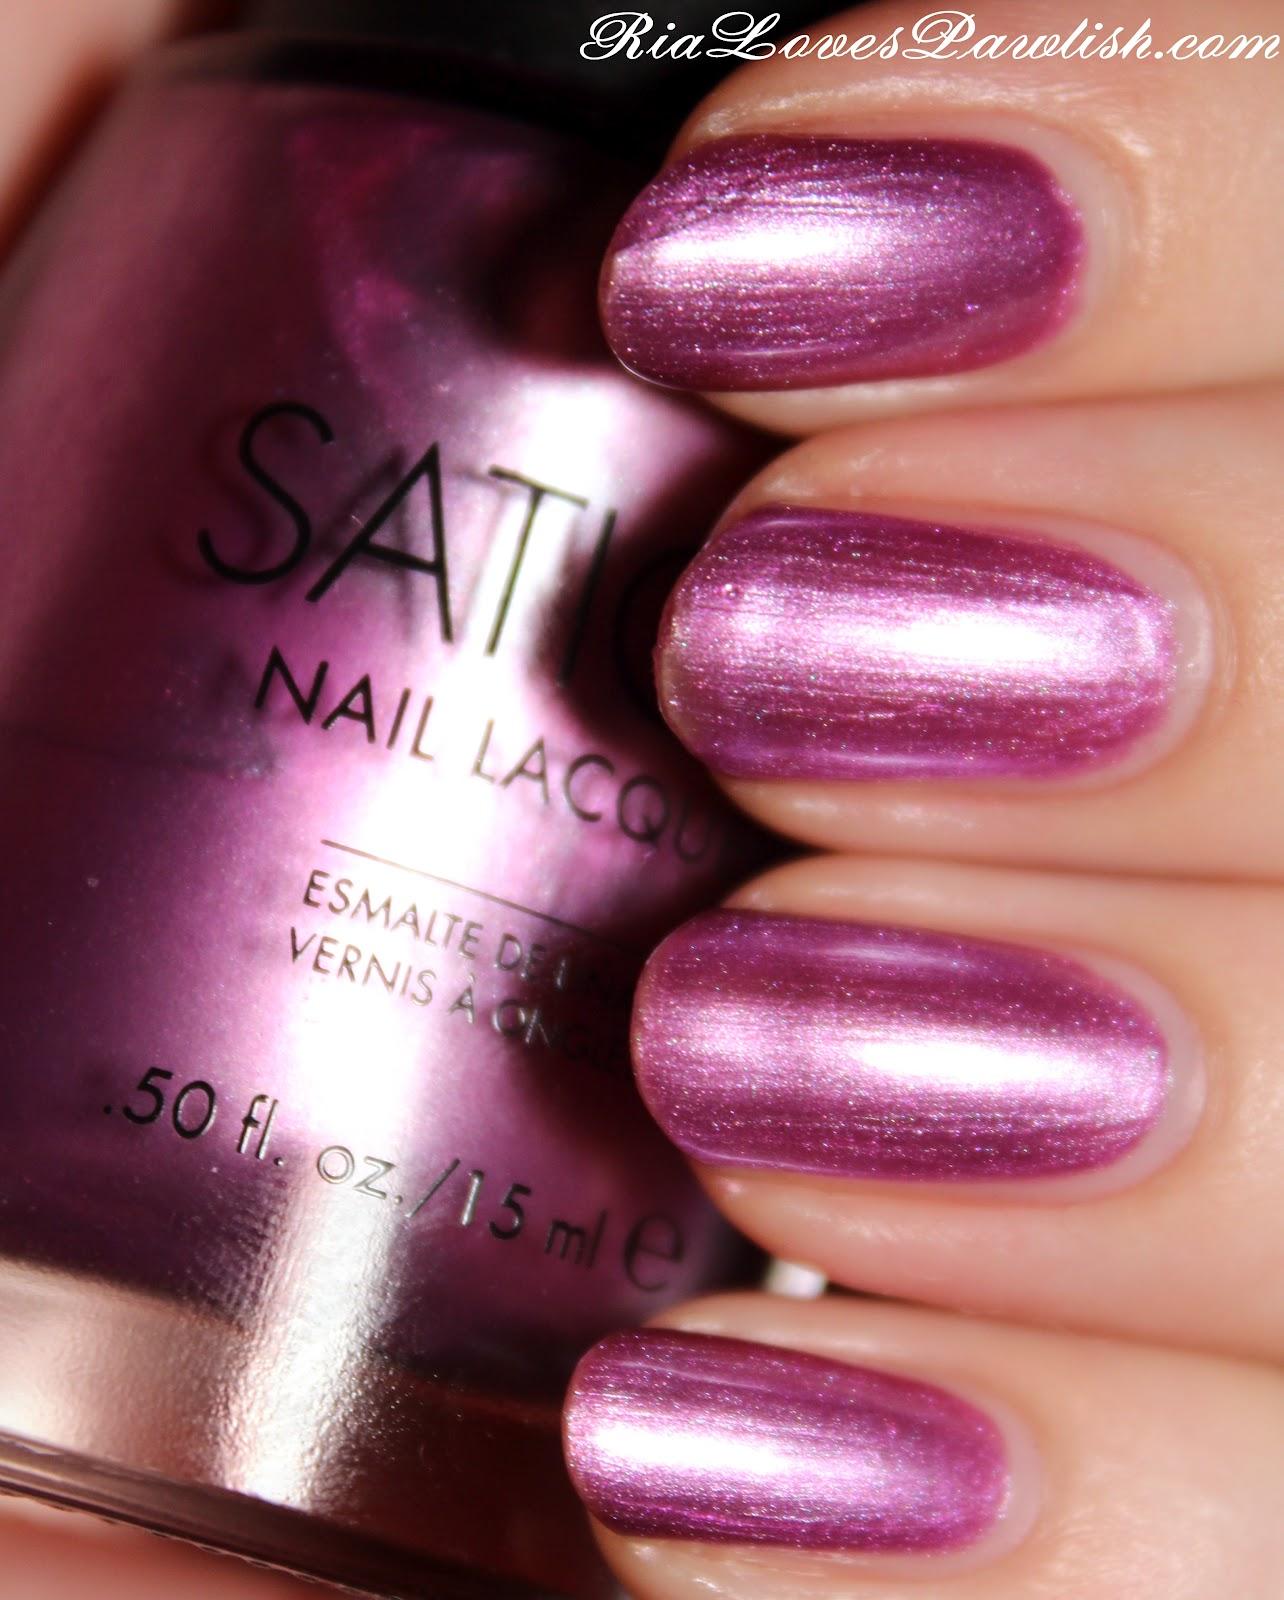 Sation Cotton Candy Nail Polish: Image Result For Sation Nail Polish Cotton Candy Nail Choices